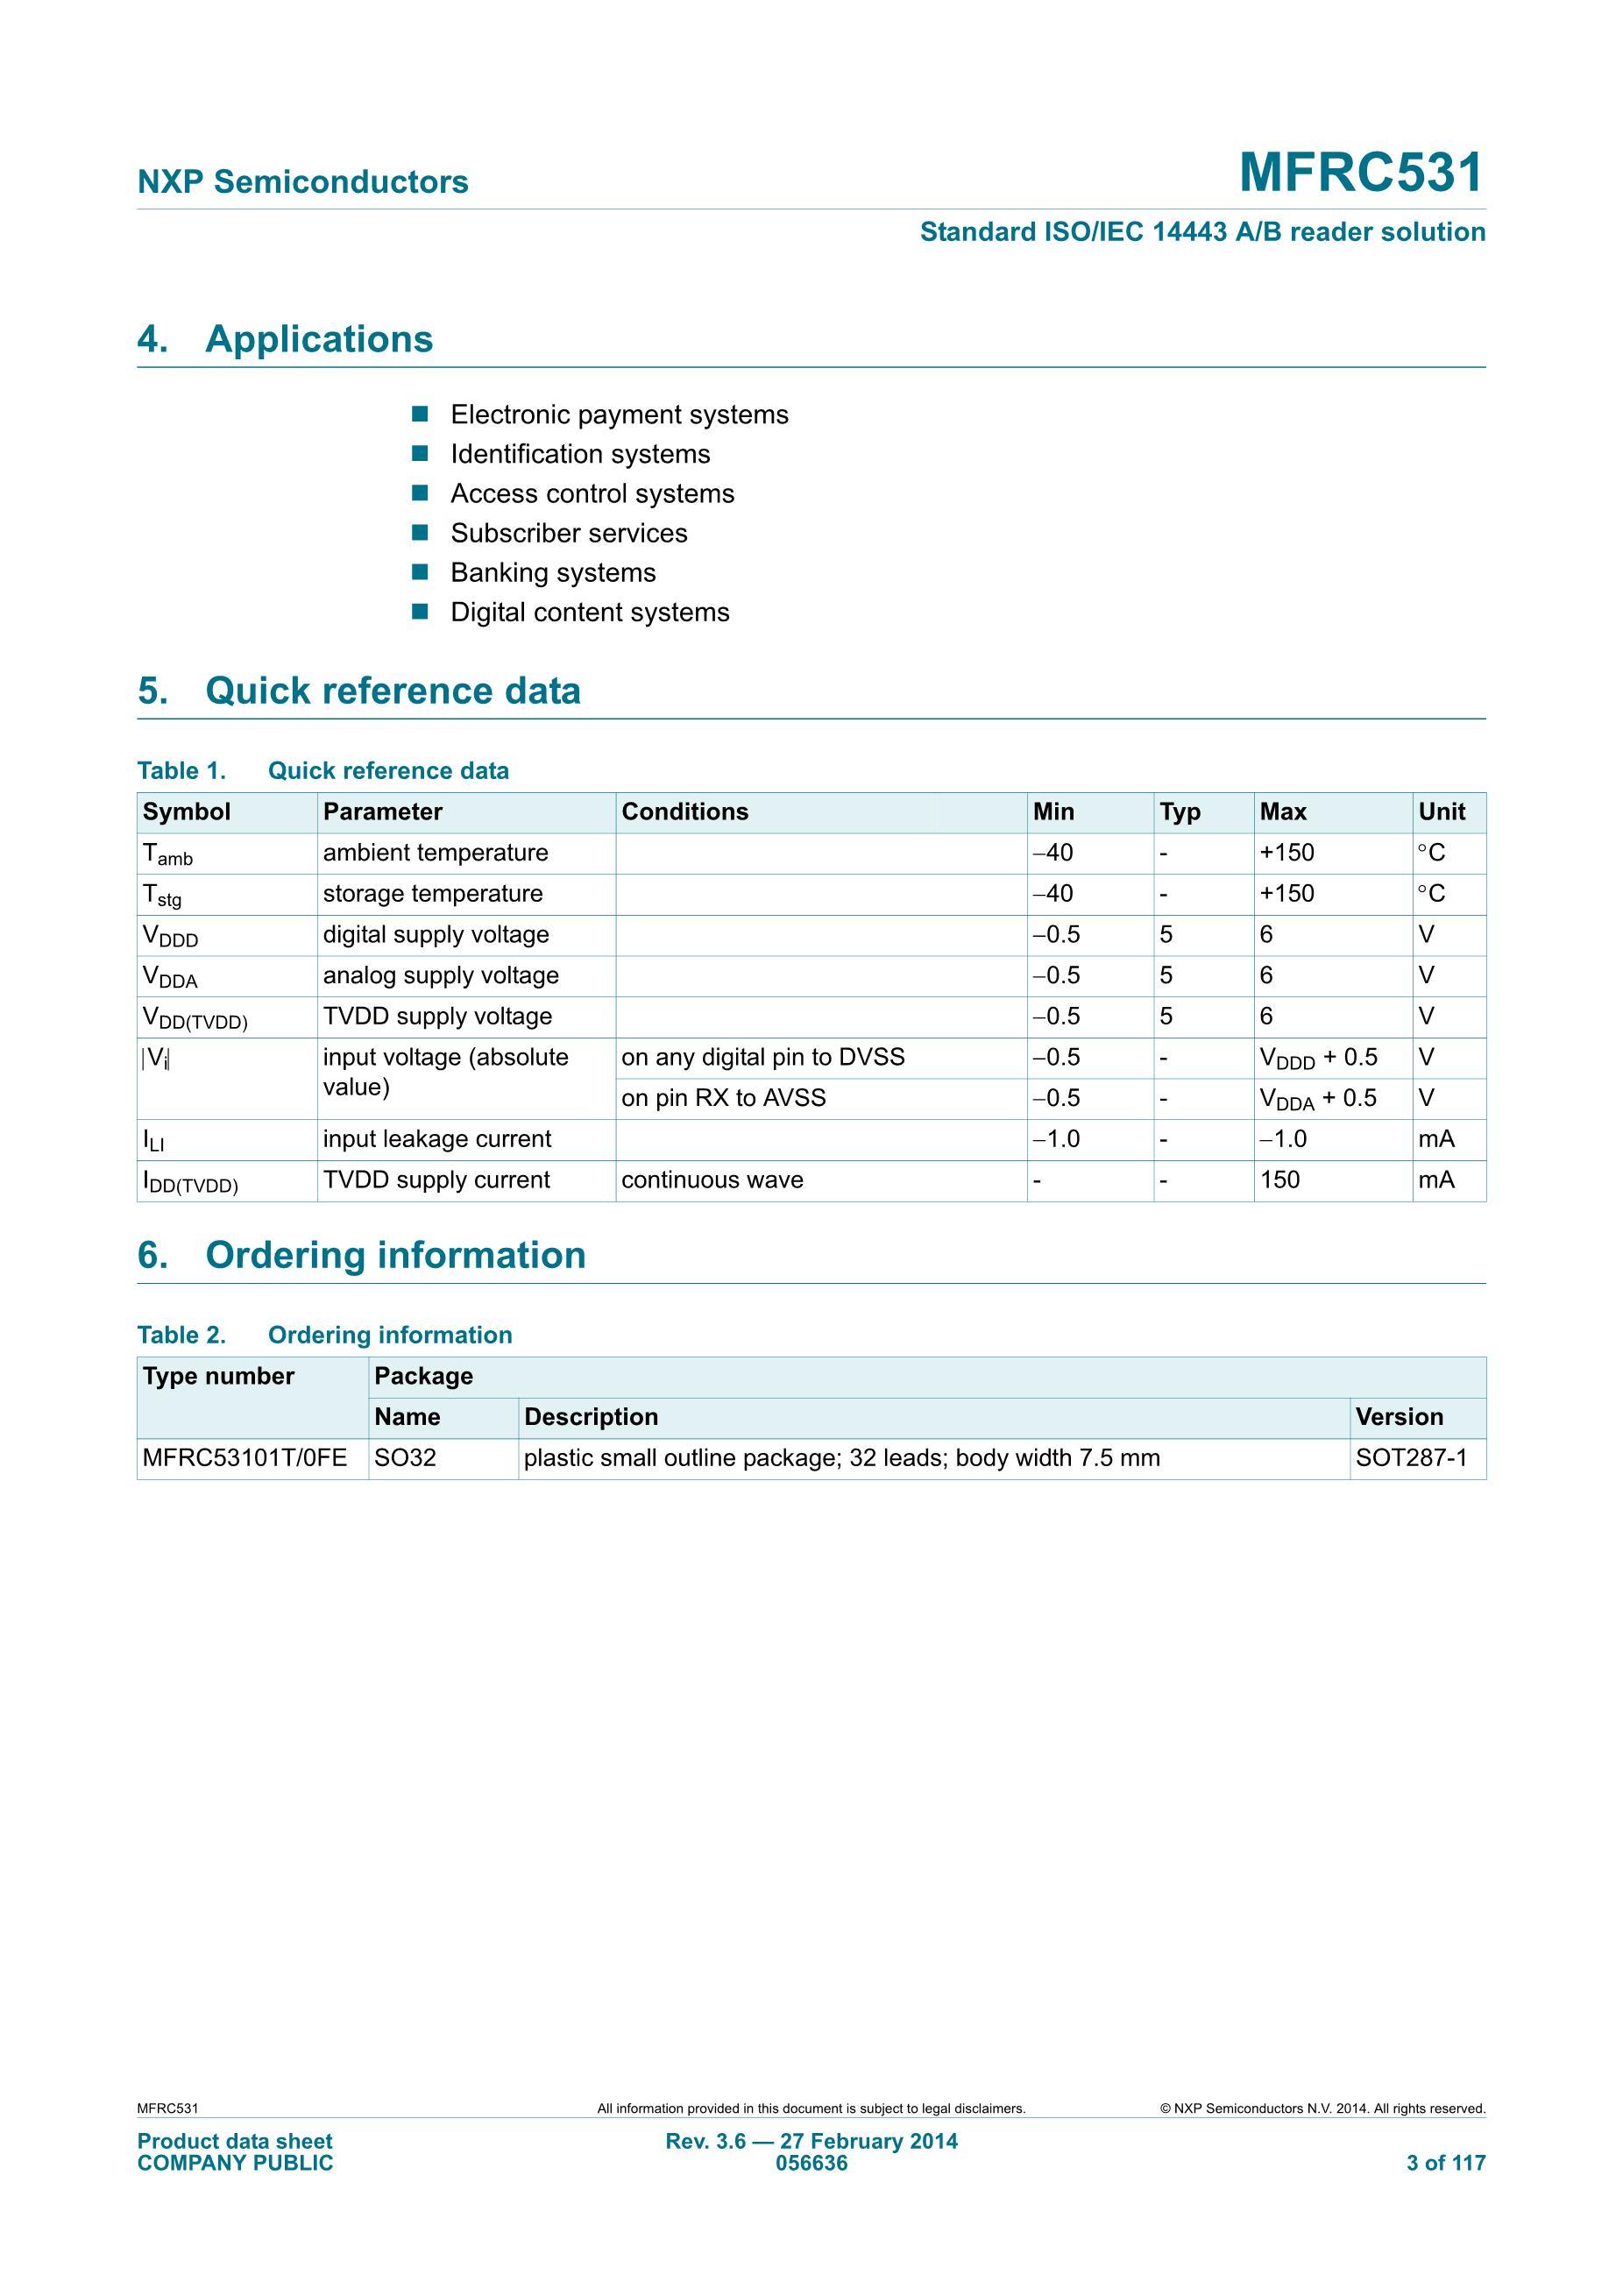 MFRC-522 RC522 RFID RF IC card induction module sent S50 Fudan card, key link's pdf picture 3